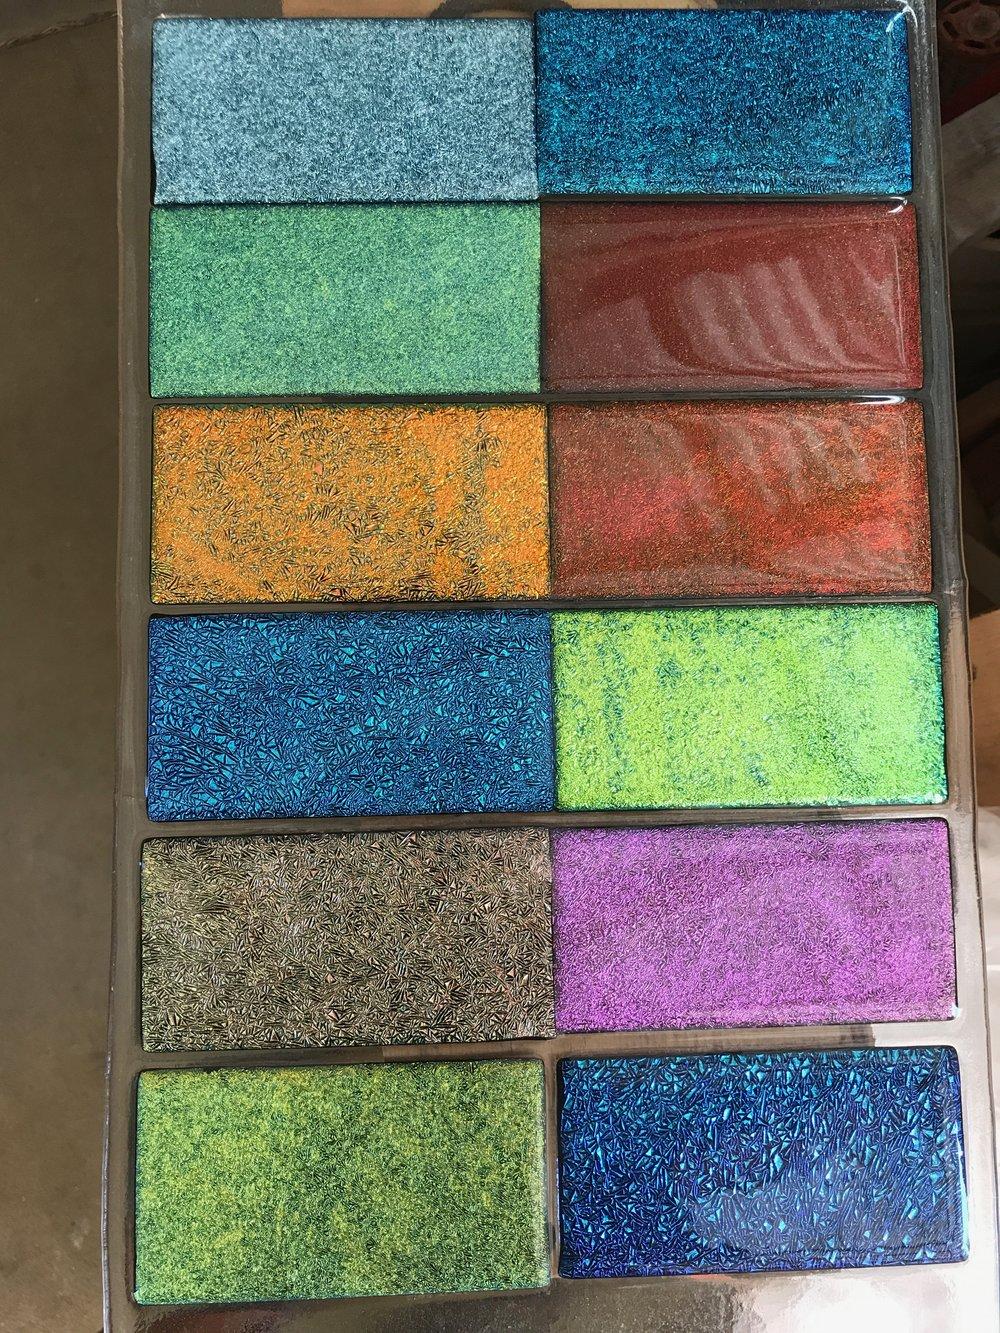 some new dichroic glass samples. strini art glass. 2017